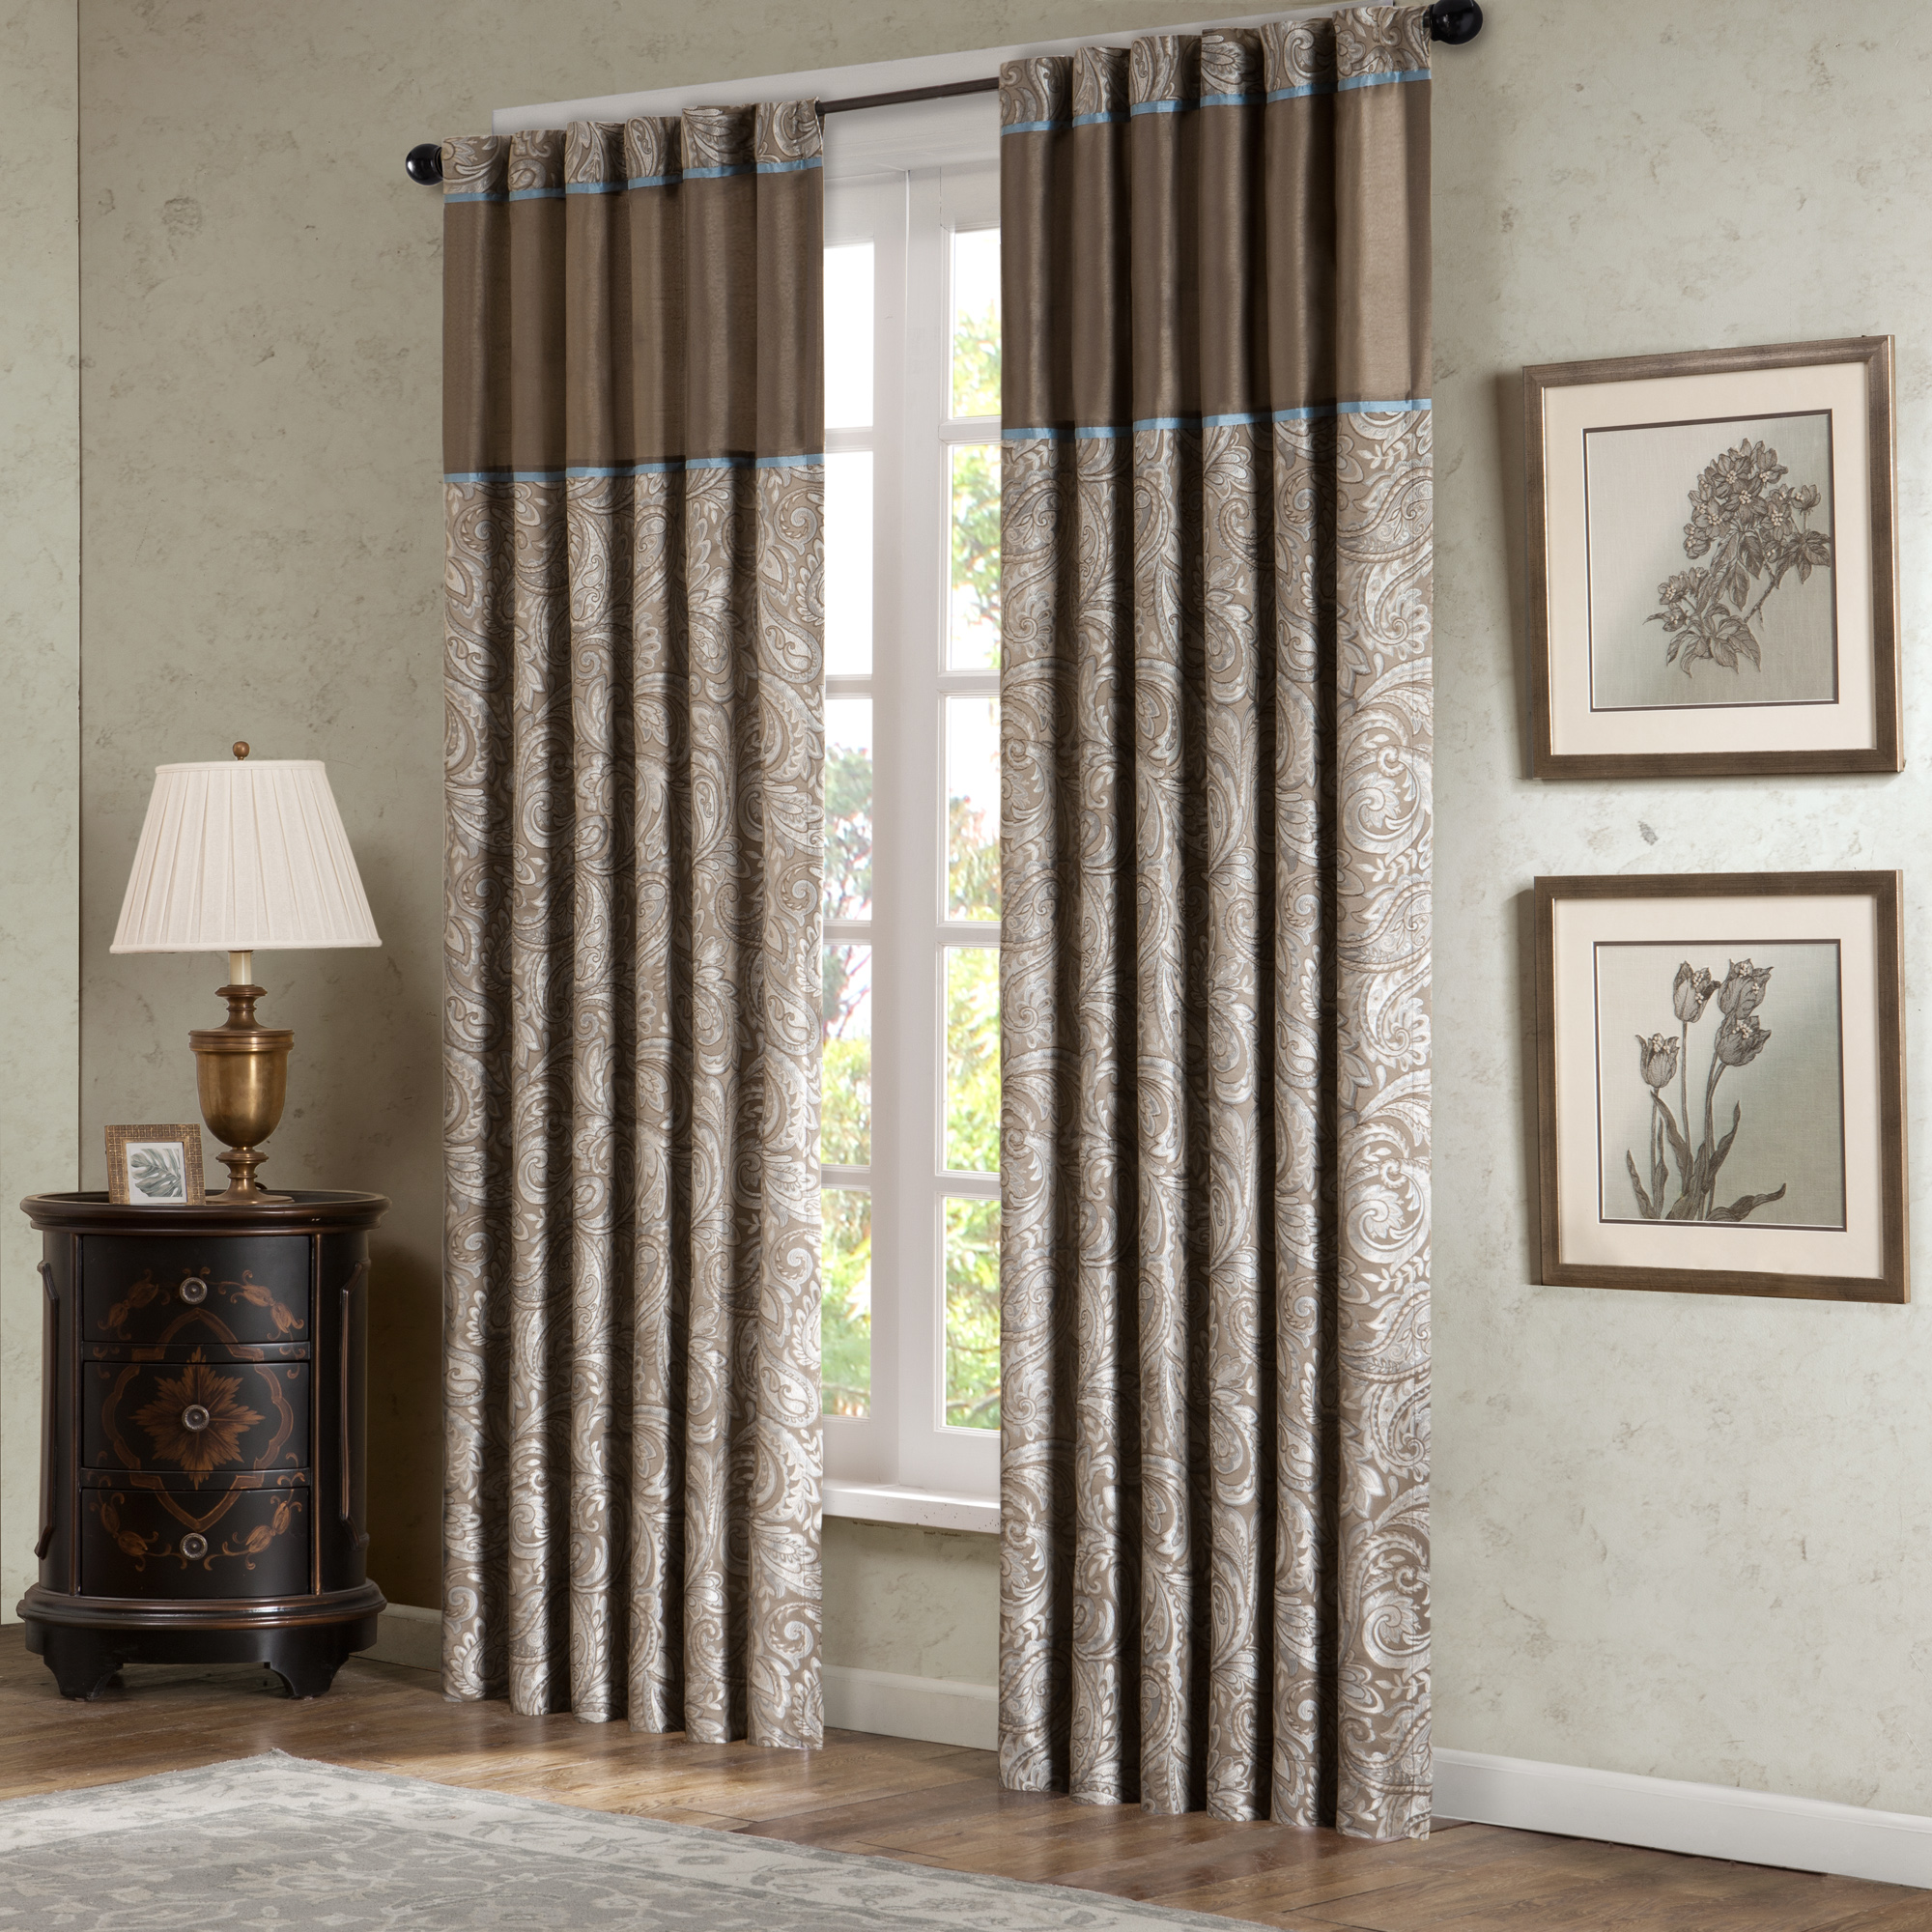 window panels madison classics valerie window panel - home - home decor - window UVOMLIX